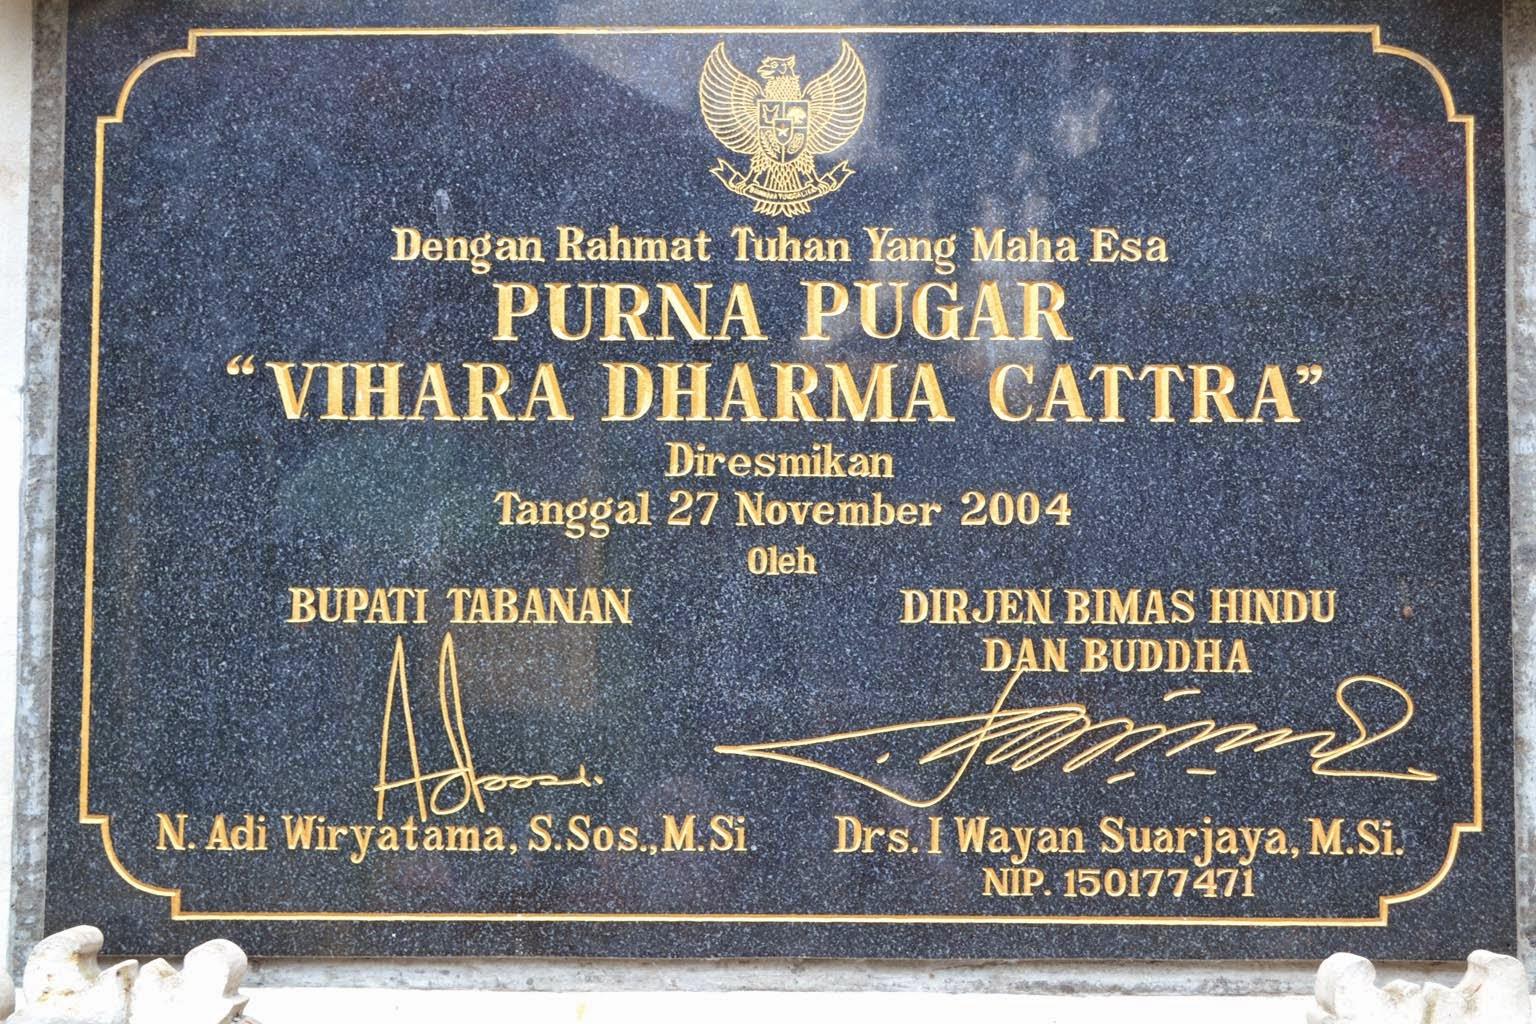 SERBA SERBI TRIDHARMA: VIHARA DHARMA CATTRA - Tabanan, Bali